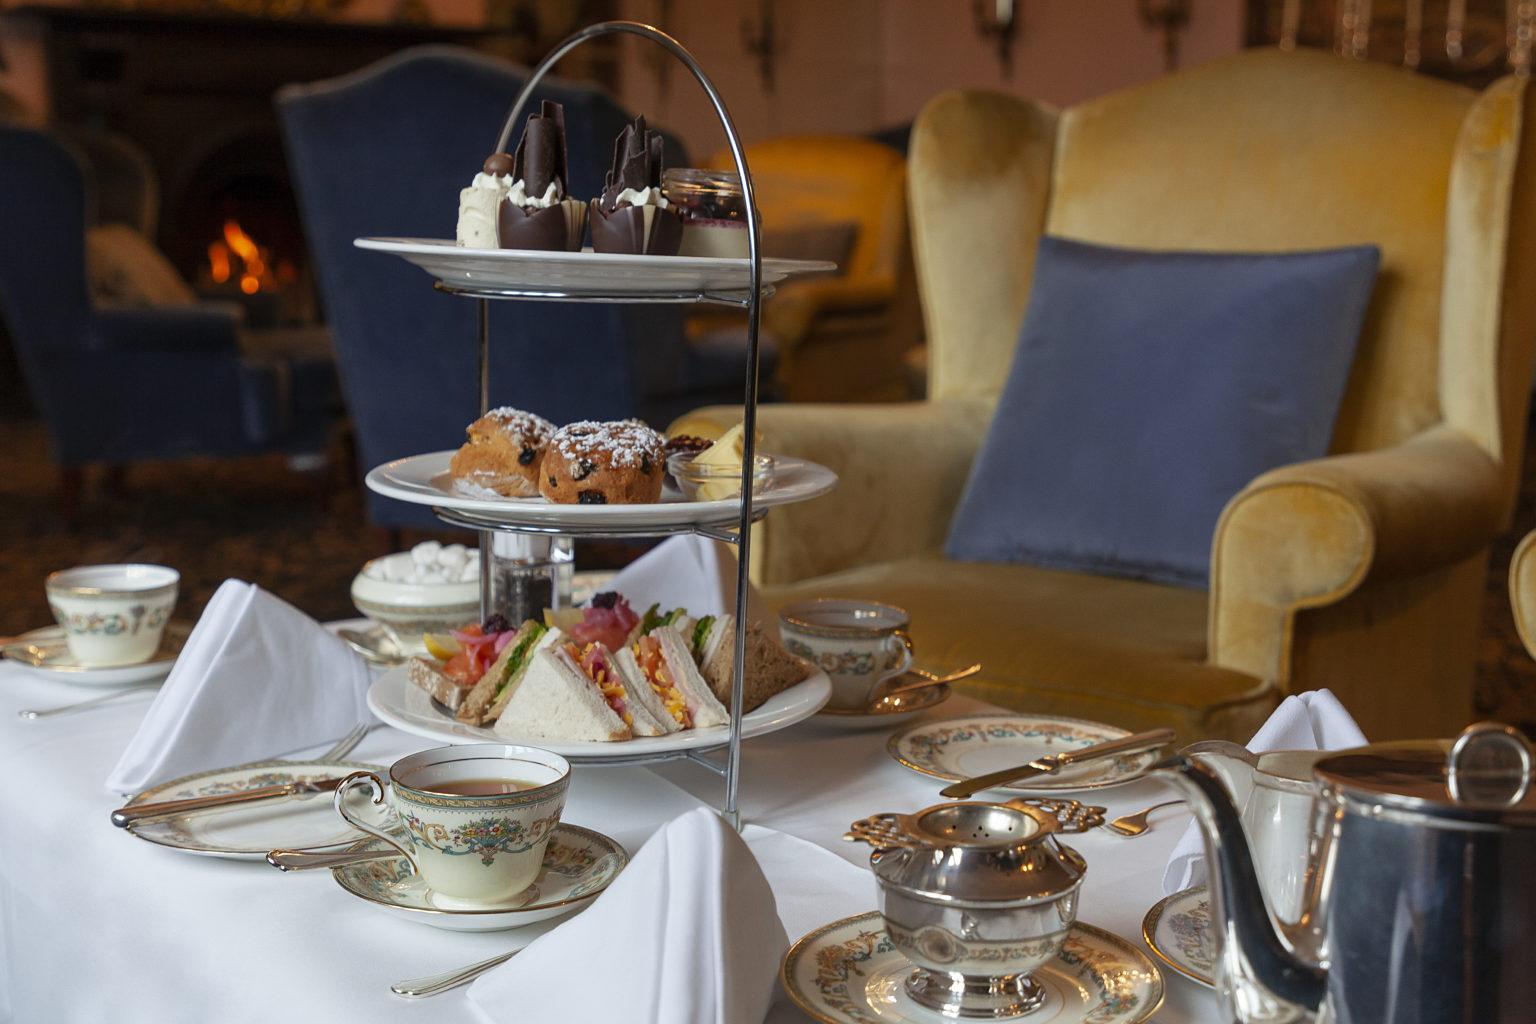 Randles Hotel Afternoon Tea